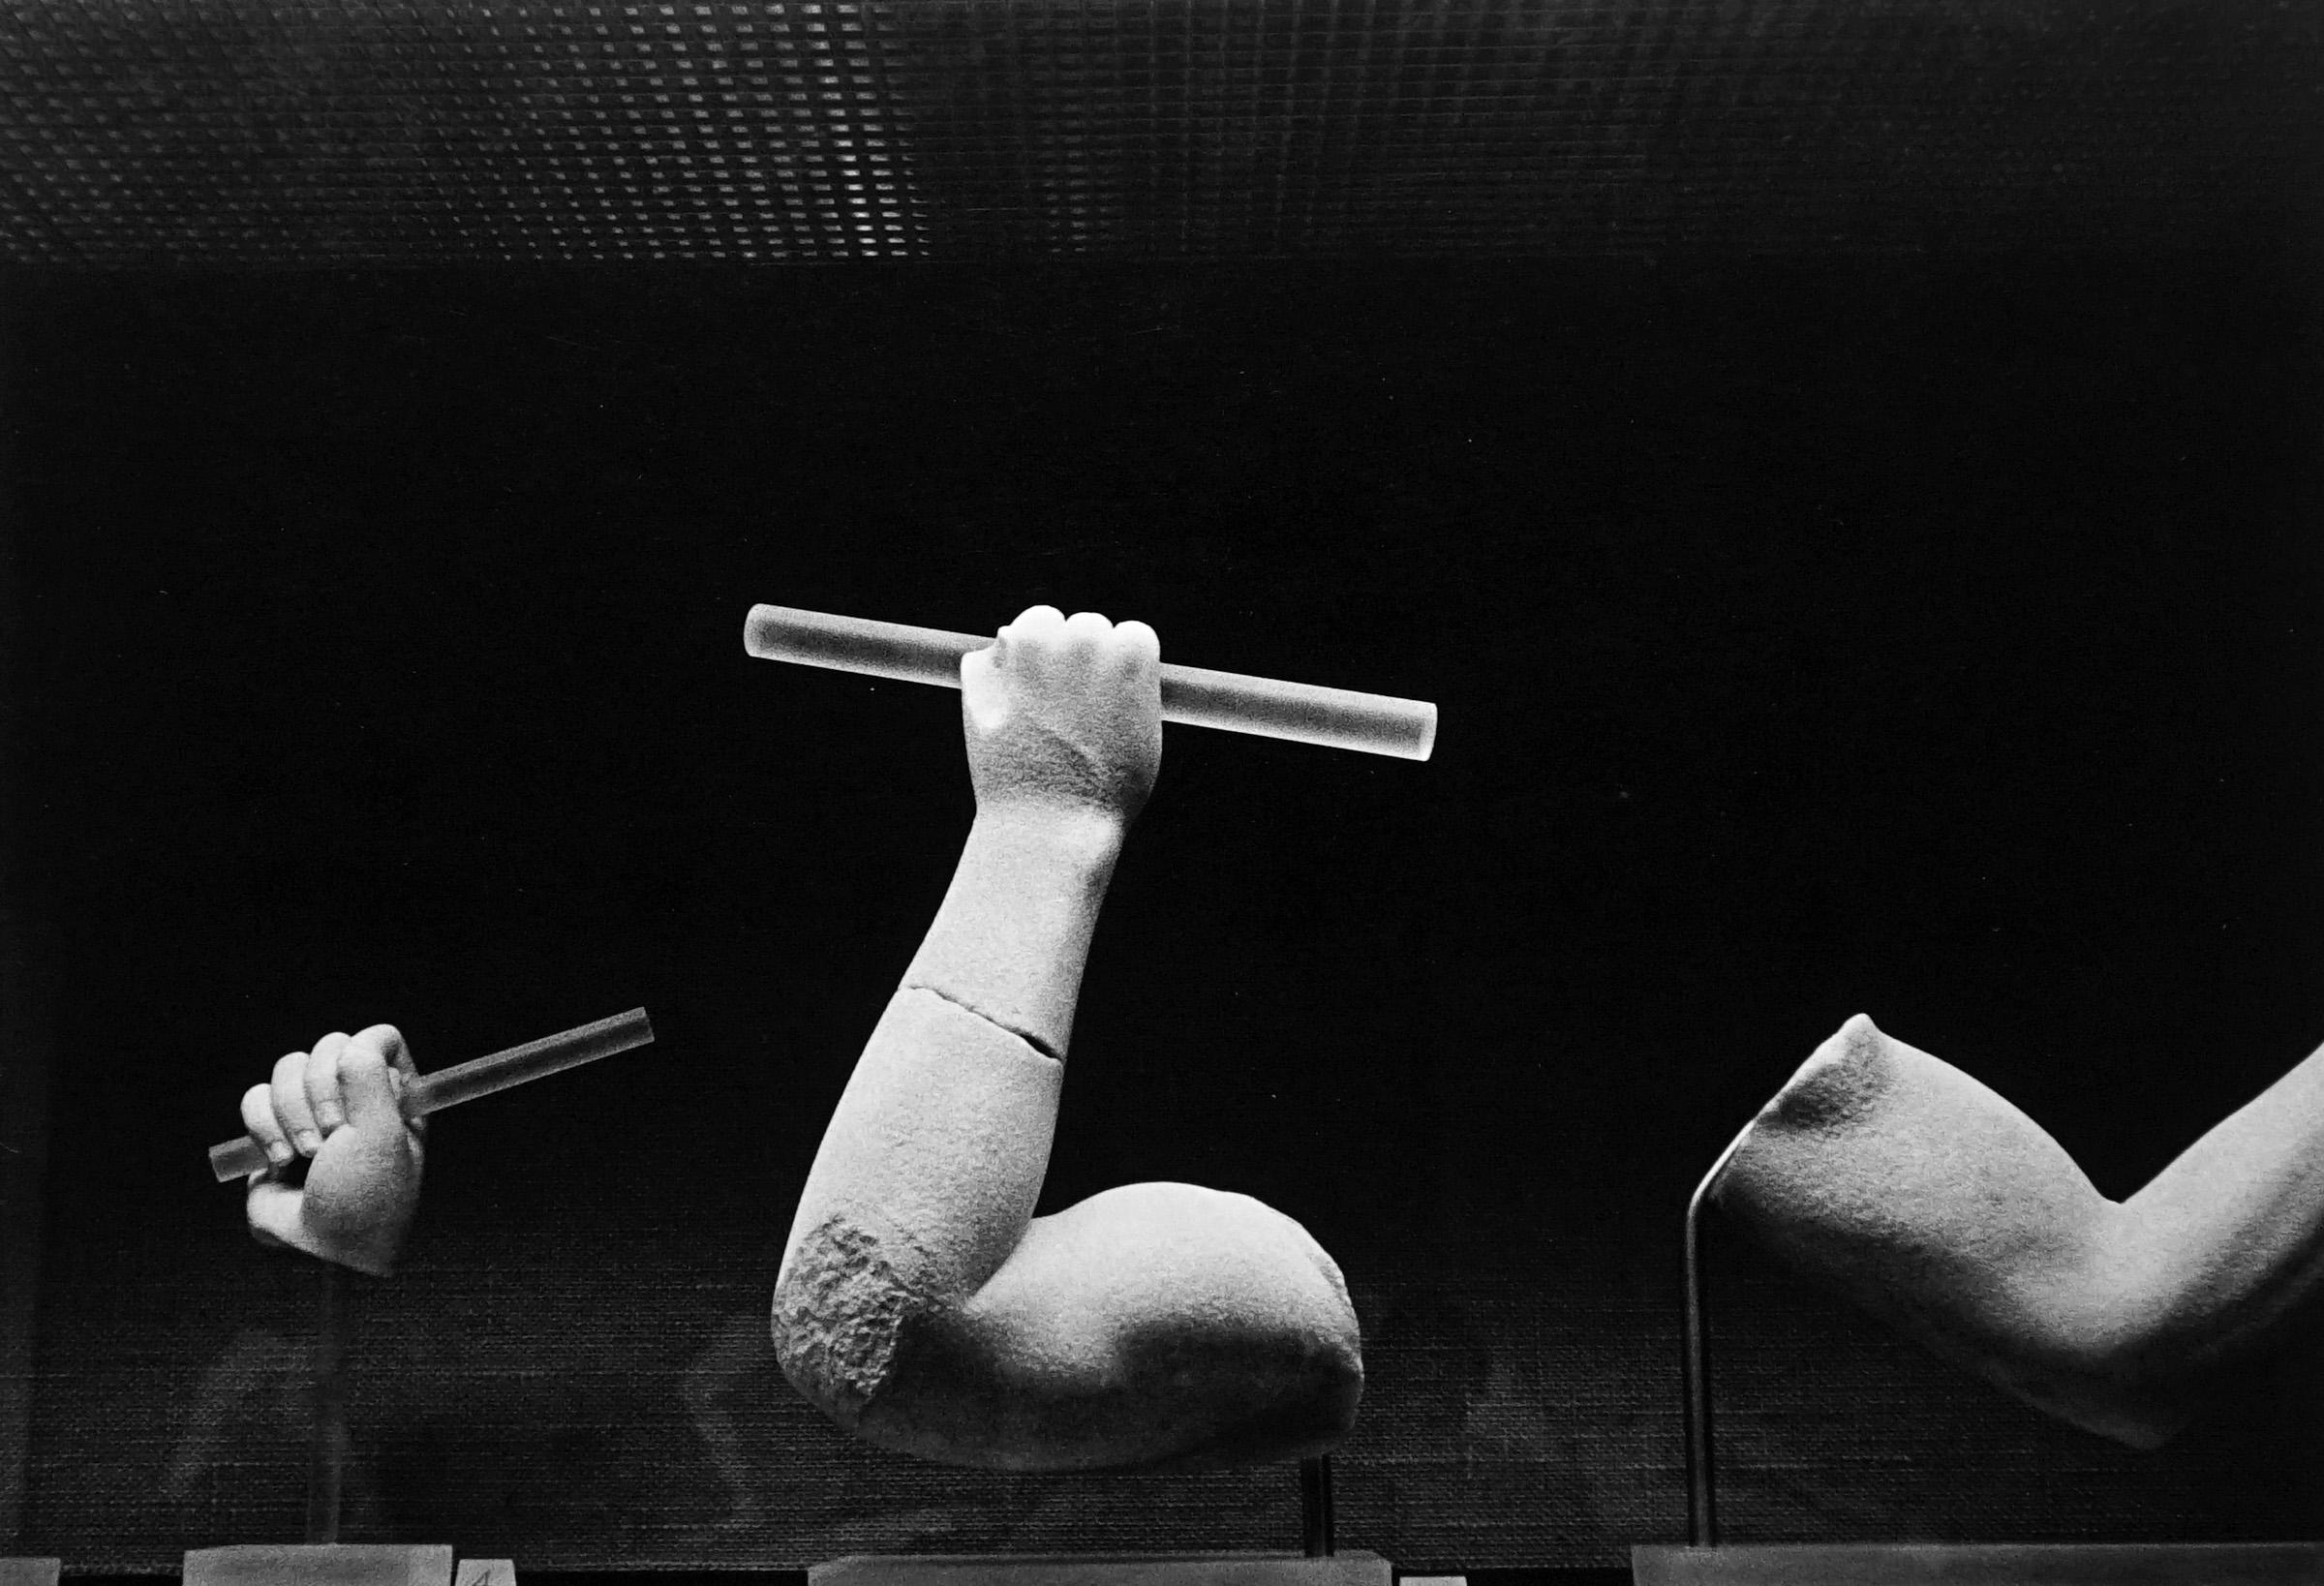 Statuary - Off-Print # 3 - 1978 - Minimalist Black & White Photography